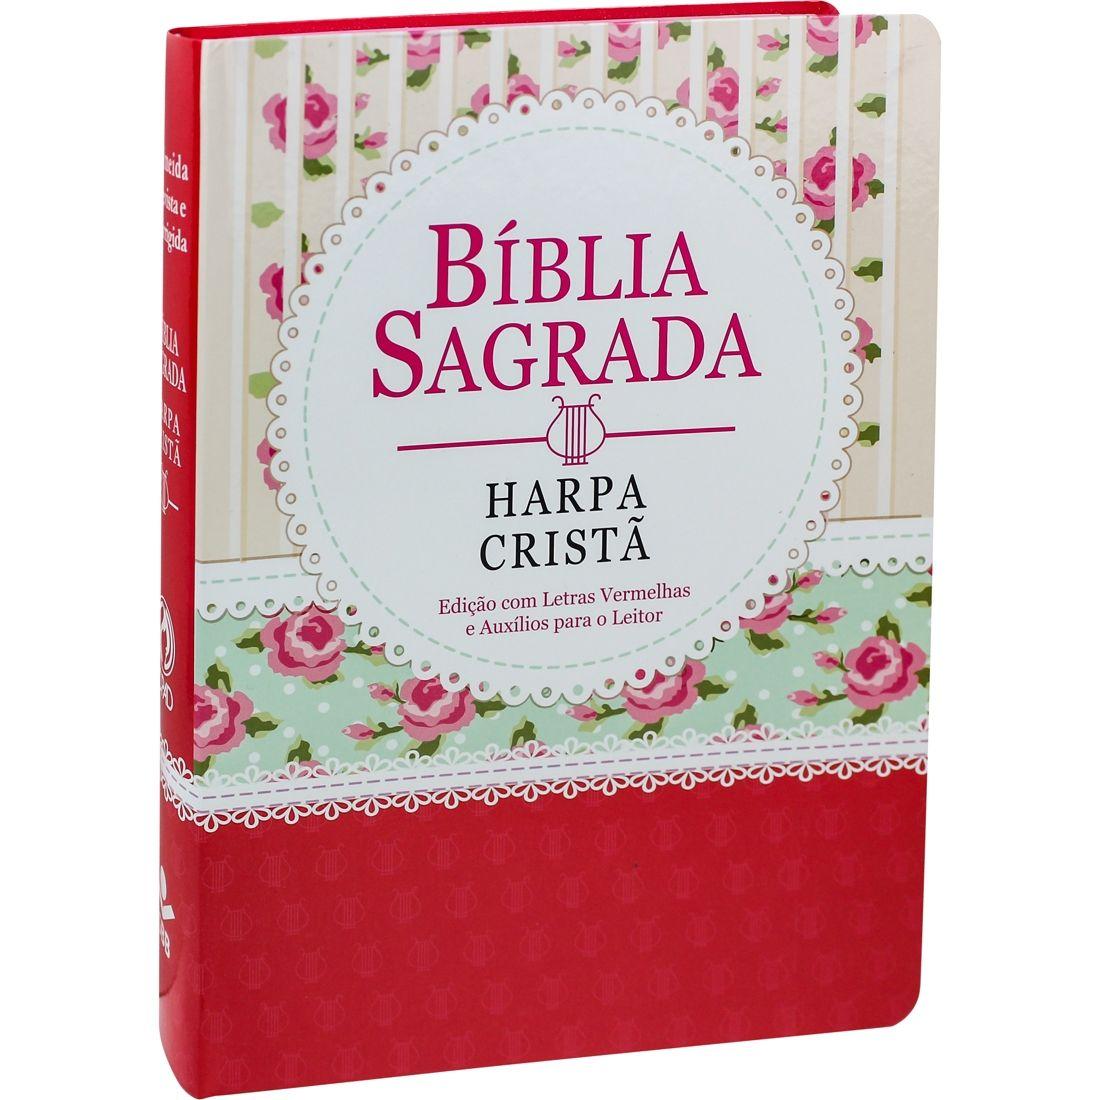 Bíblia Sagrada com Harpa Cristã - Letra Gigante - Florida Renda